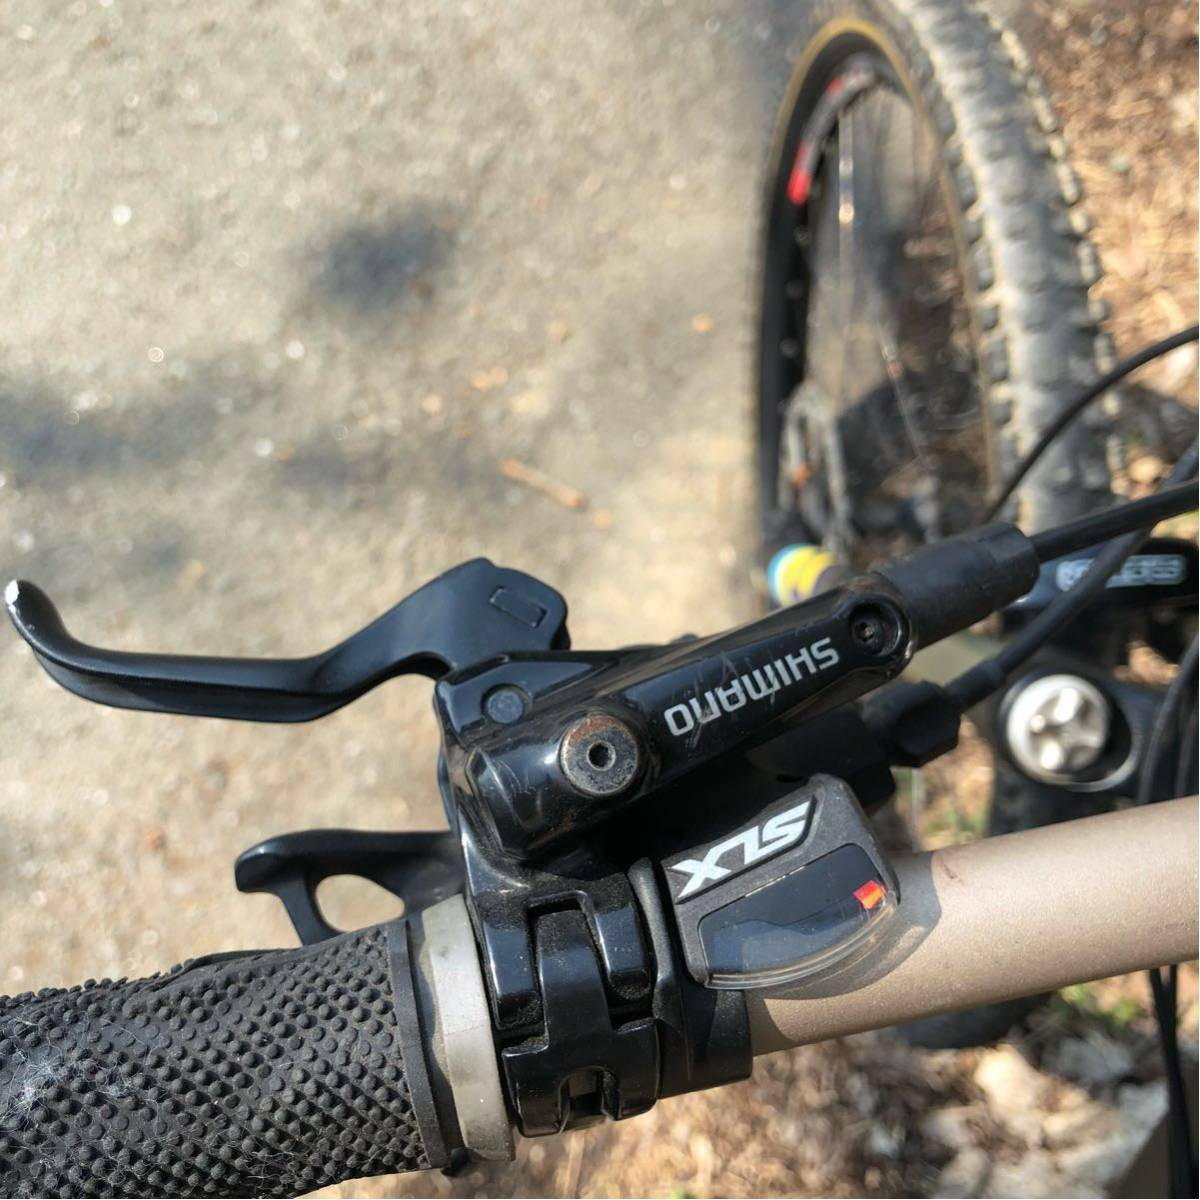 TREK GaryFisher MTB 改造多数 26 ストリート ダウンヒル トライアル BMX マウンテンバイク cannondale specialized fuji giant kona _画像5